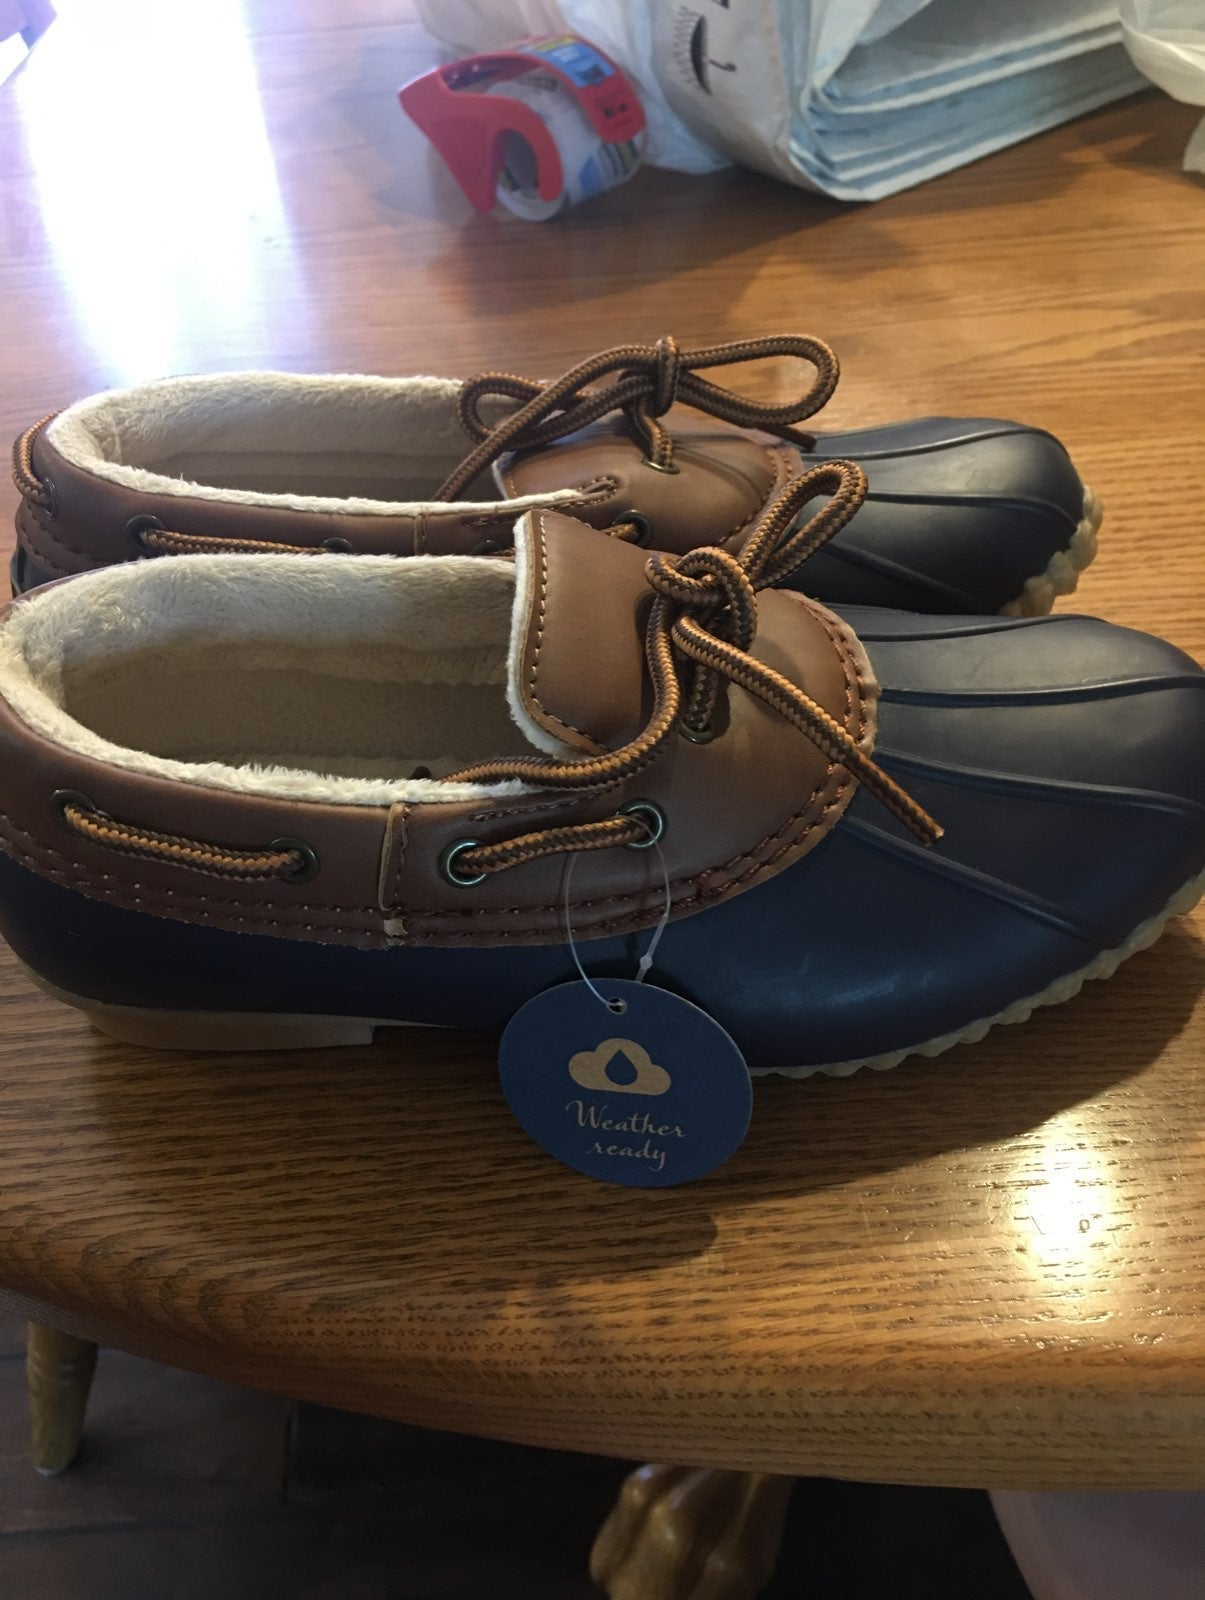 Jbu by jambu weather ready shoes size 6